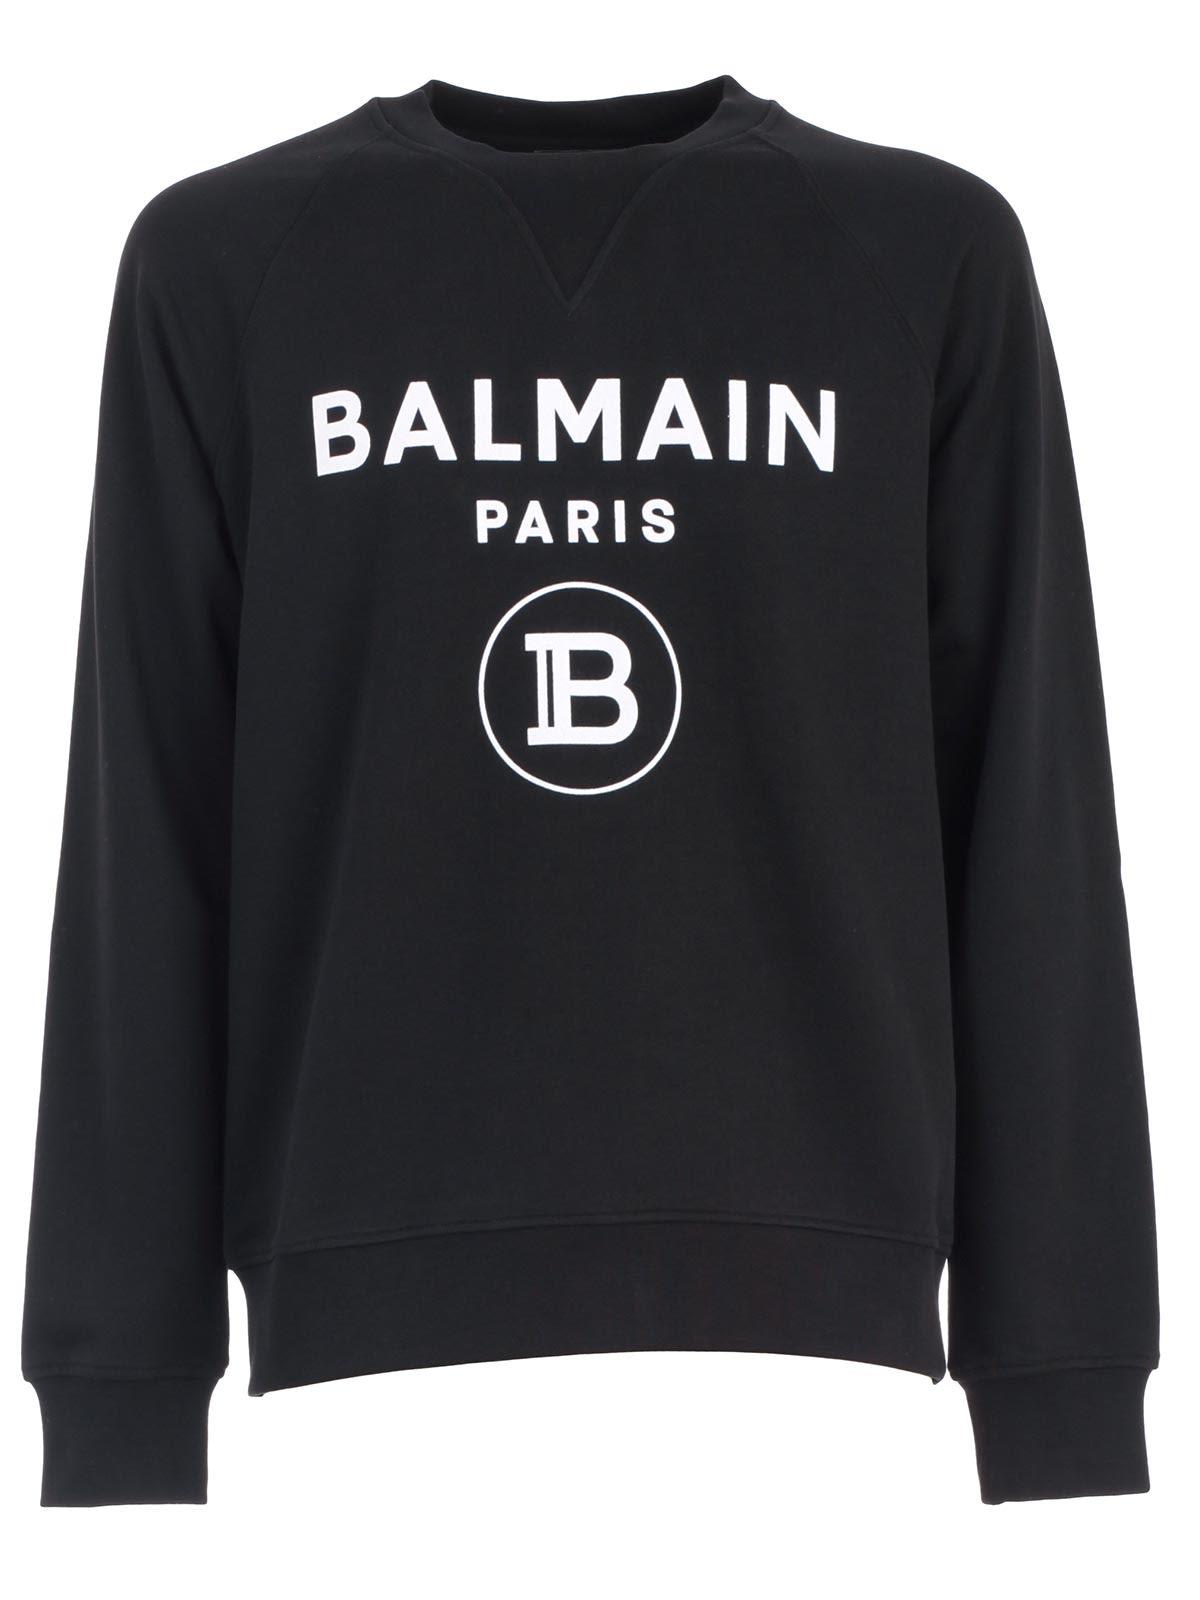 Balmain Flock Sweater